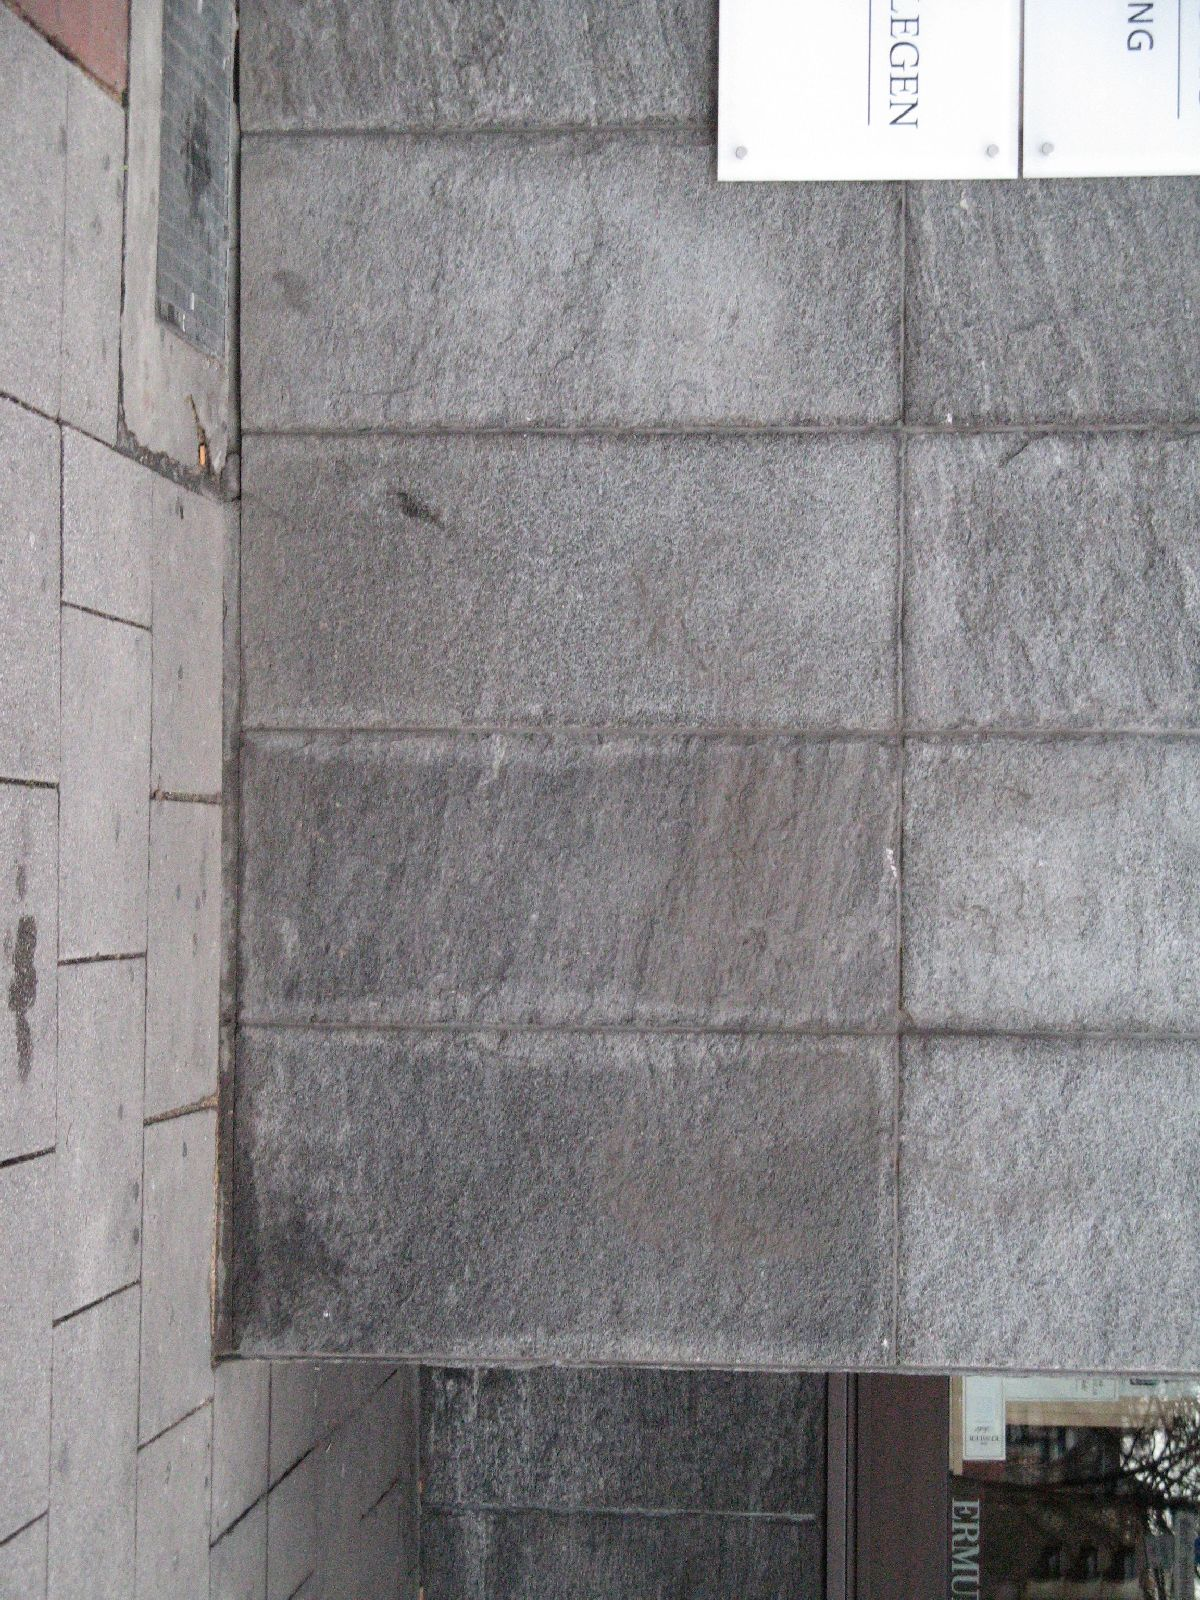 Building_Texture_B_04048